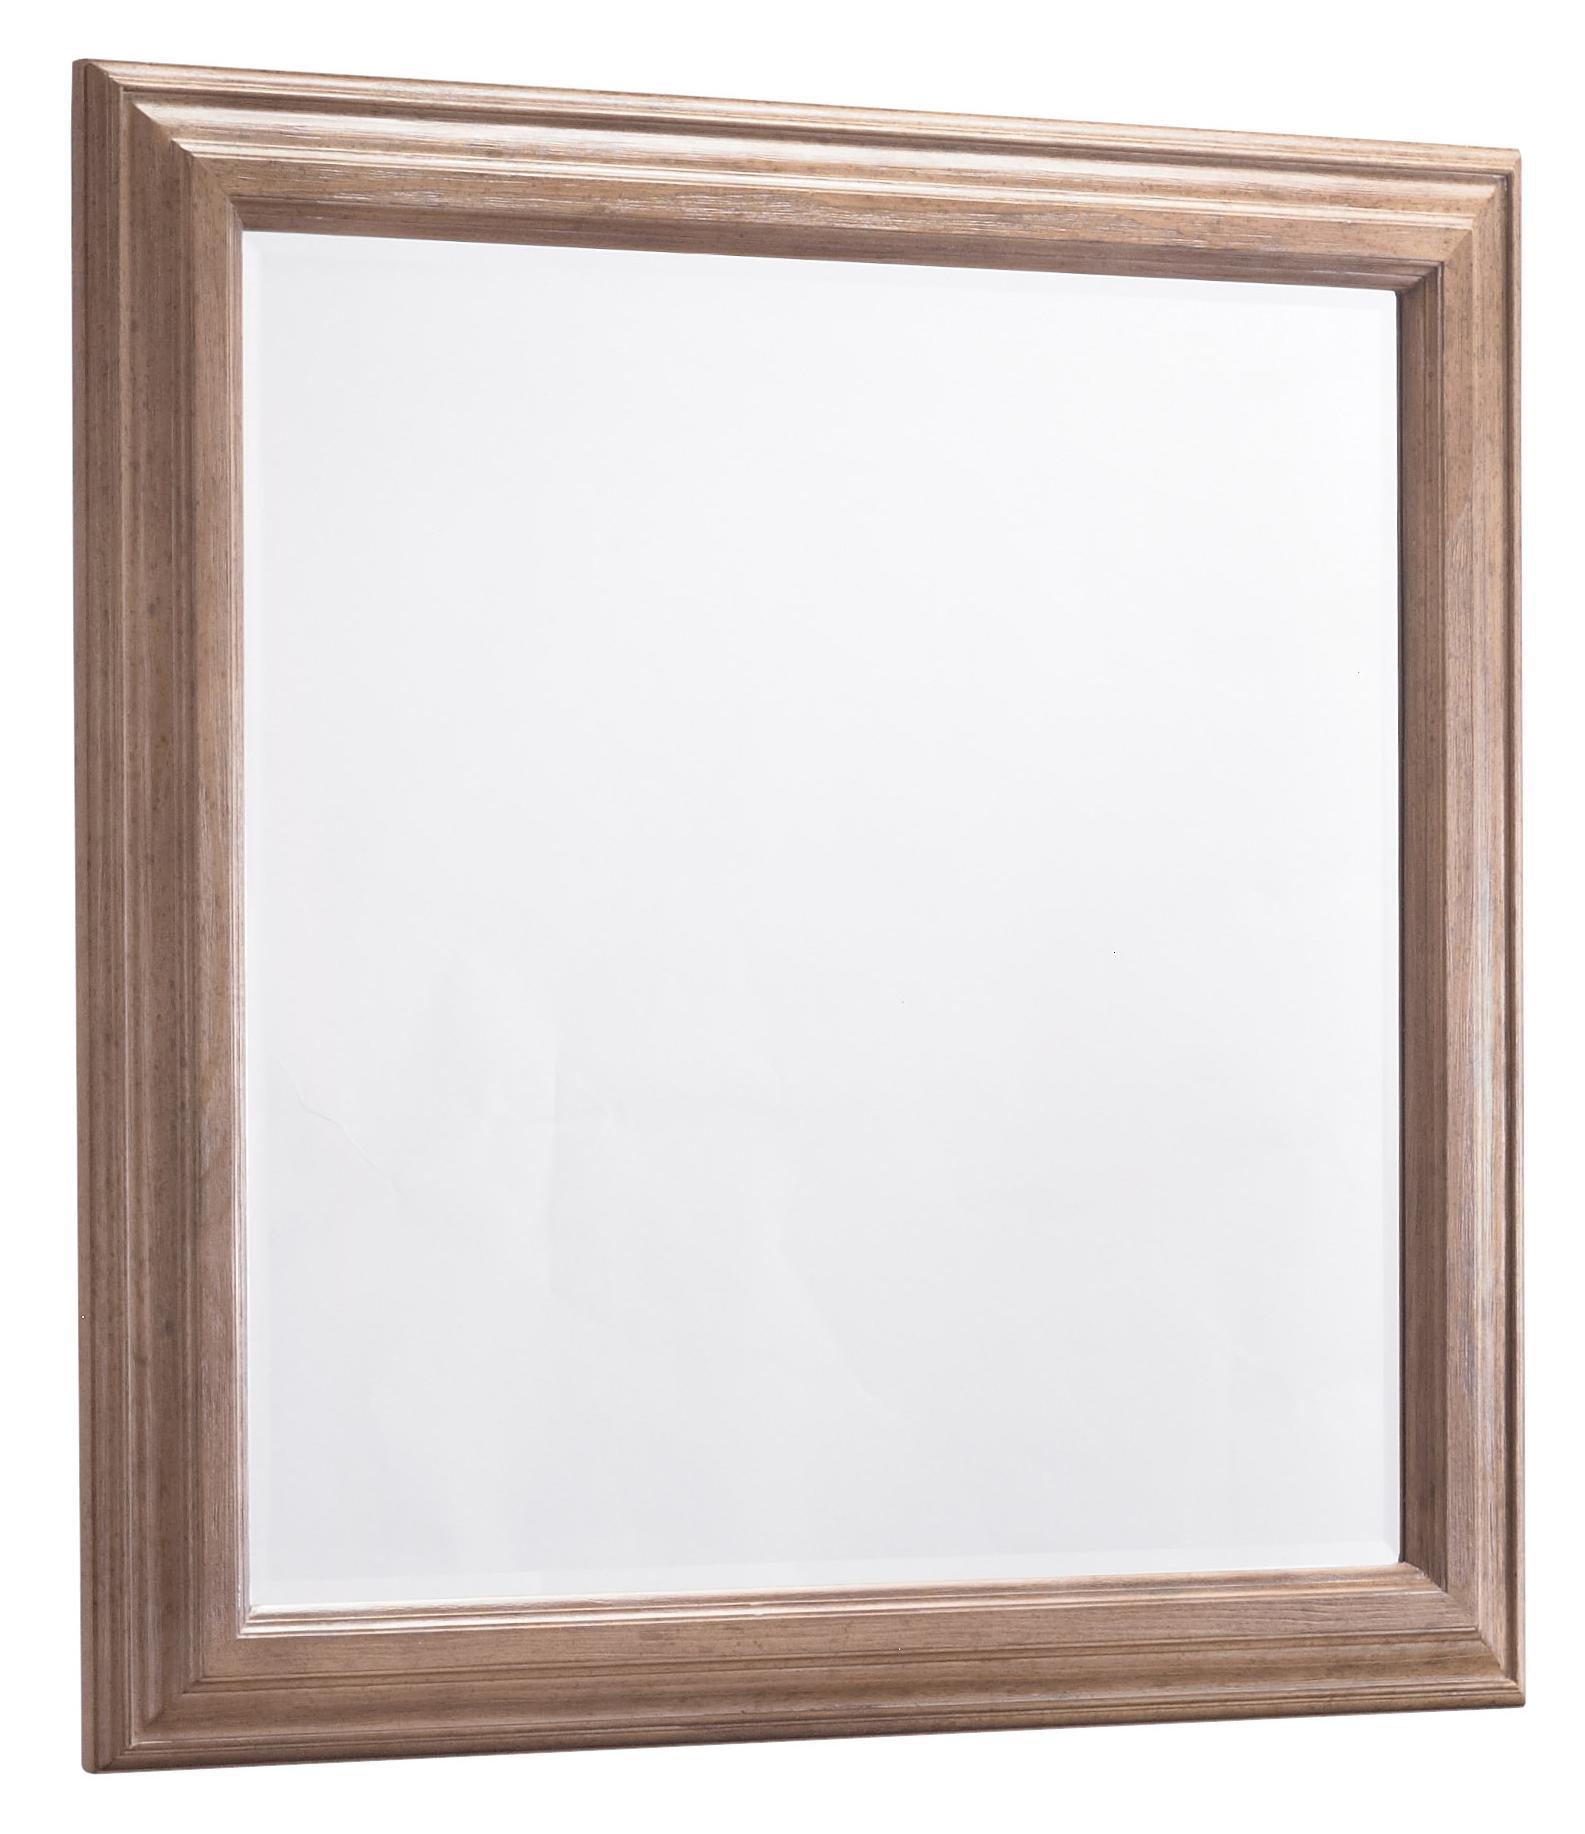 Belfort Signature Madera Mirror - Item Number: 192120-2303